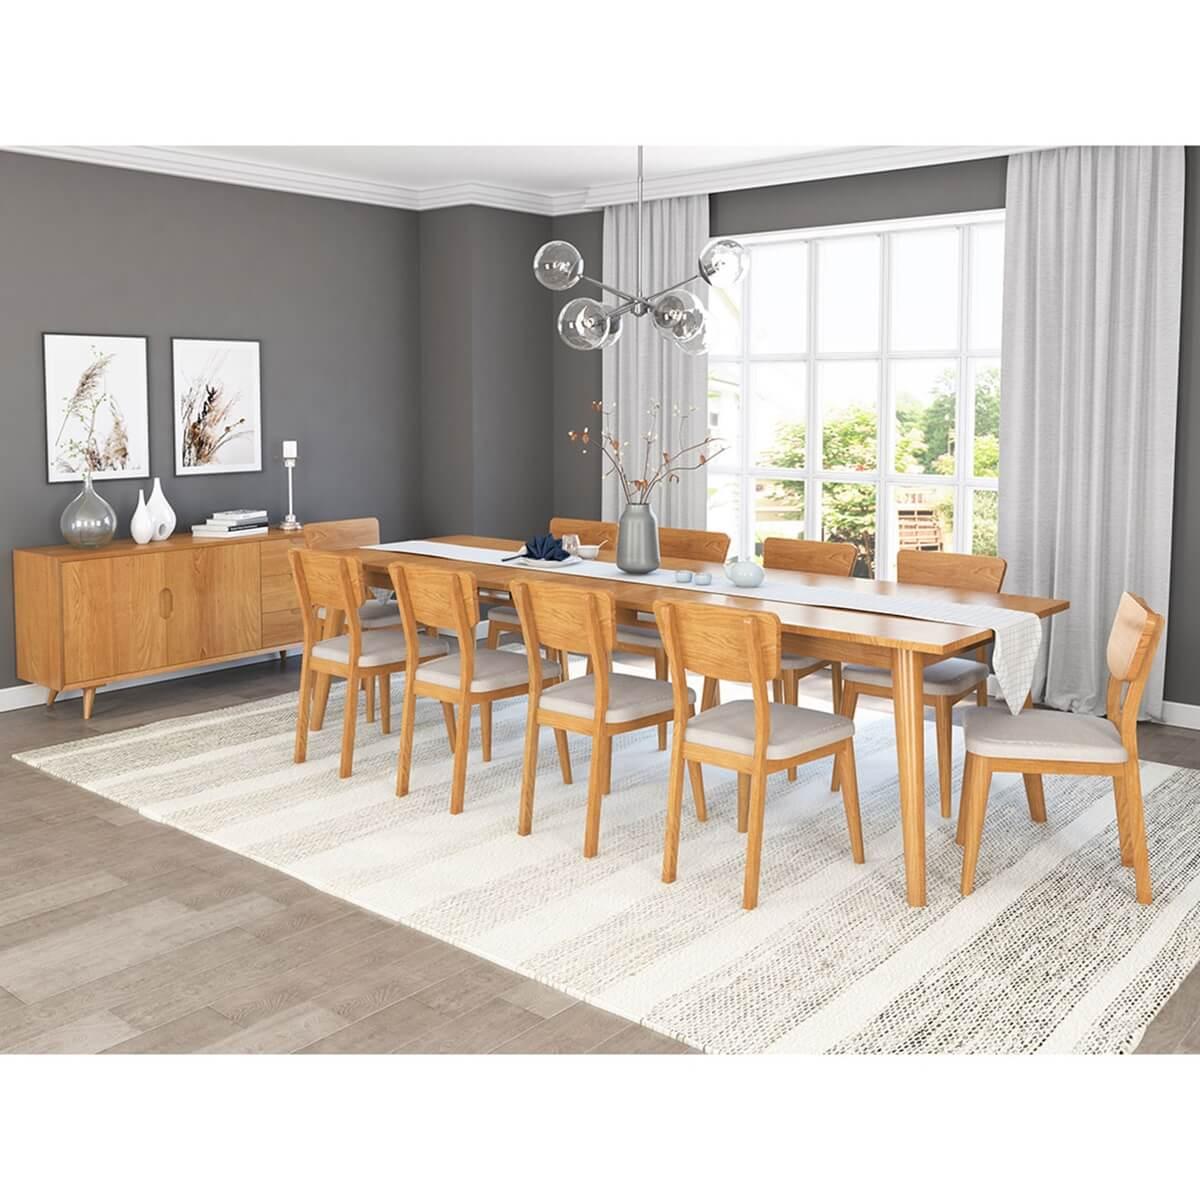 12 Piece Dining Room Set: Cierra Solid Teak Wood Mid Century 12 Piece Dining Room Set